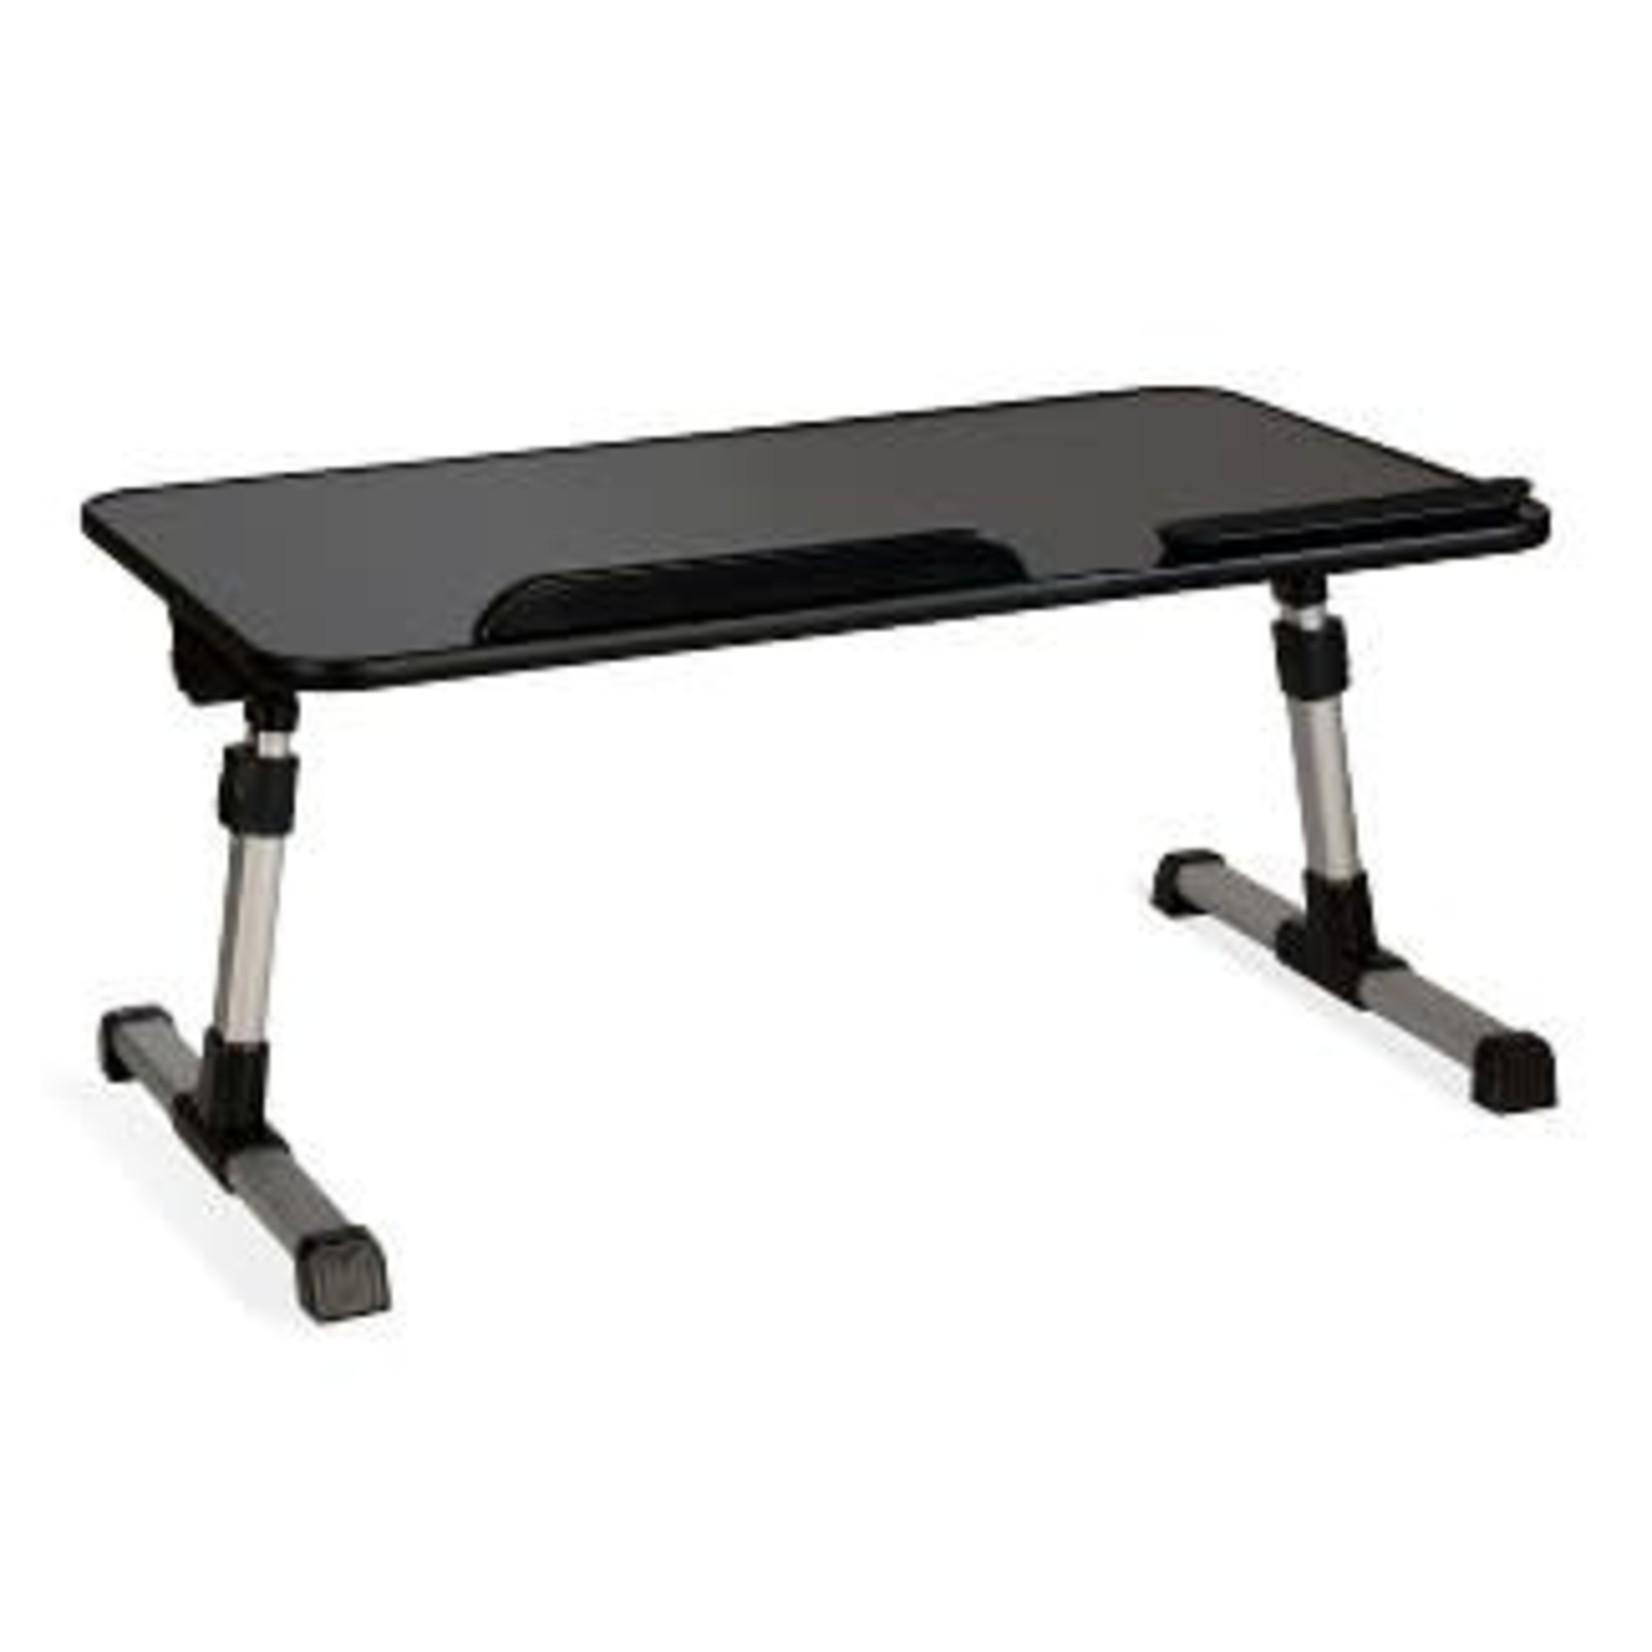 Xl Laptop Table Black - Atlantic